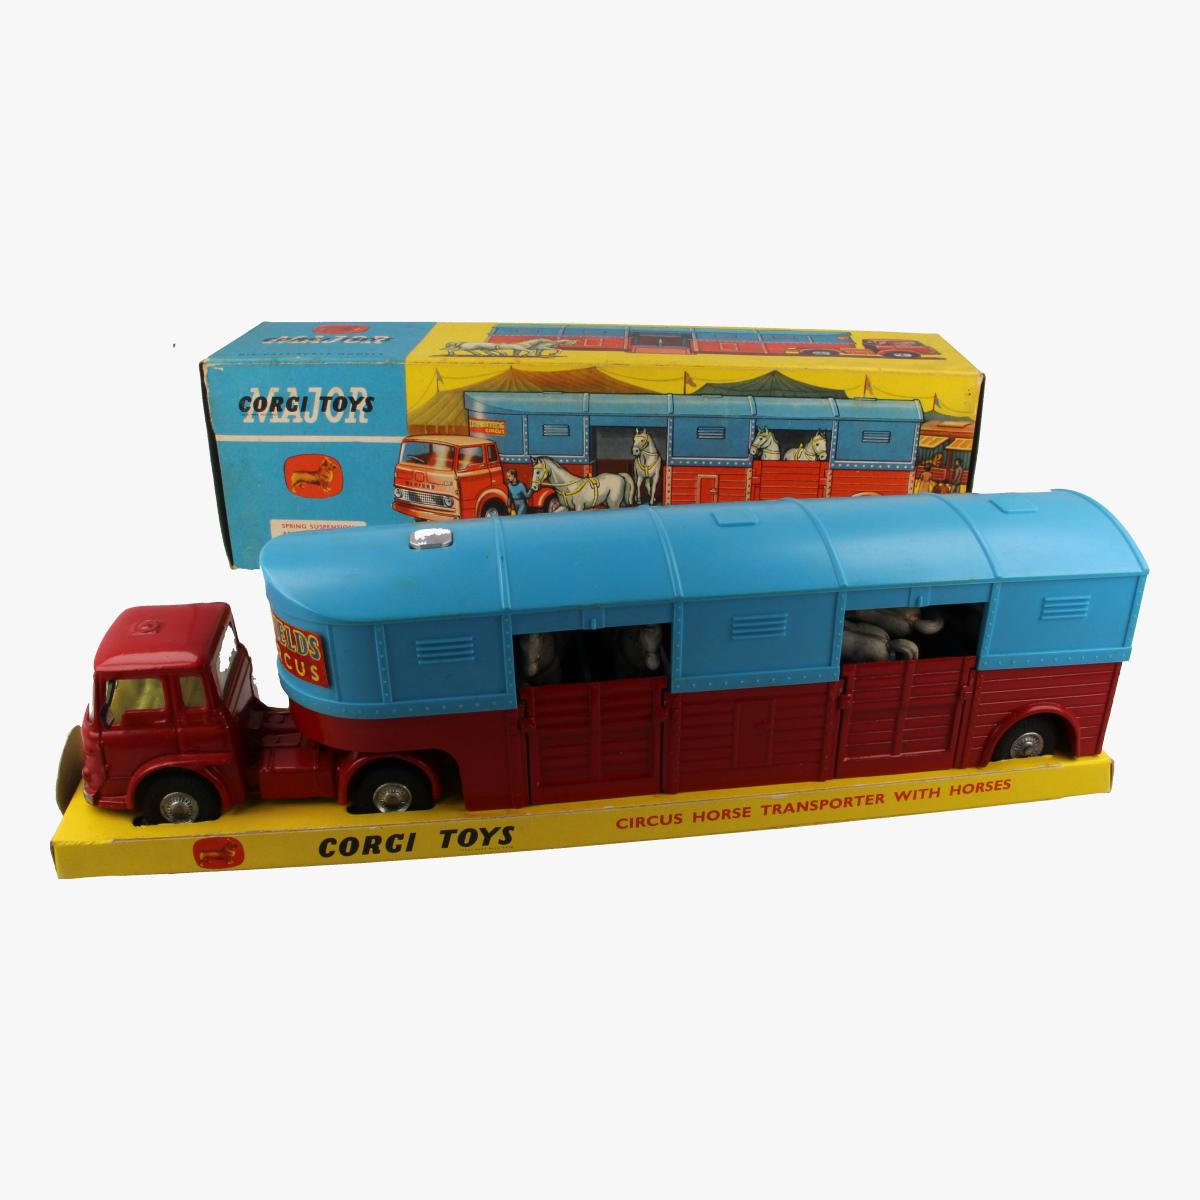 Afbeeldingen van Corgi Toys. Circus Horse Transporter with horses. Nr. 1130